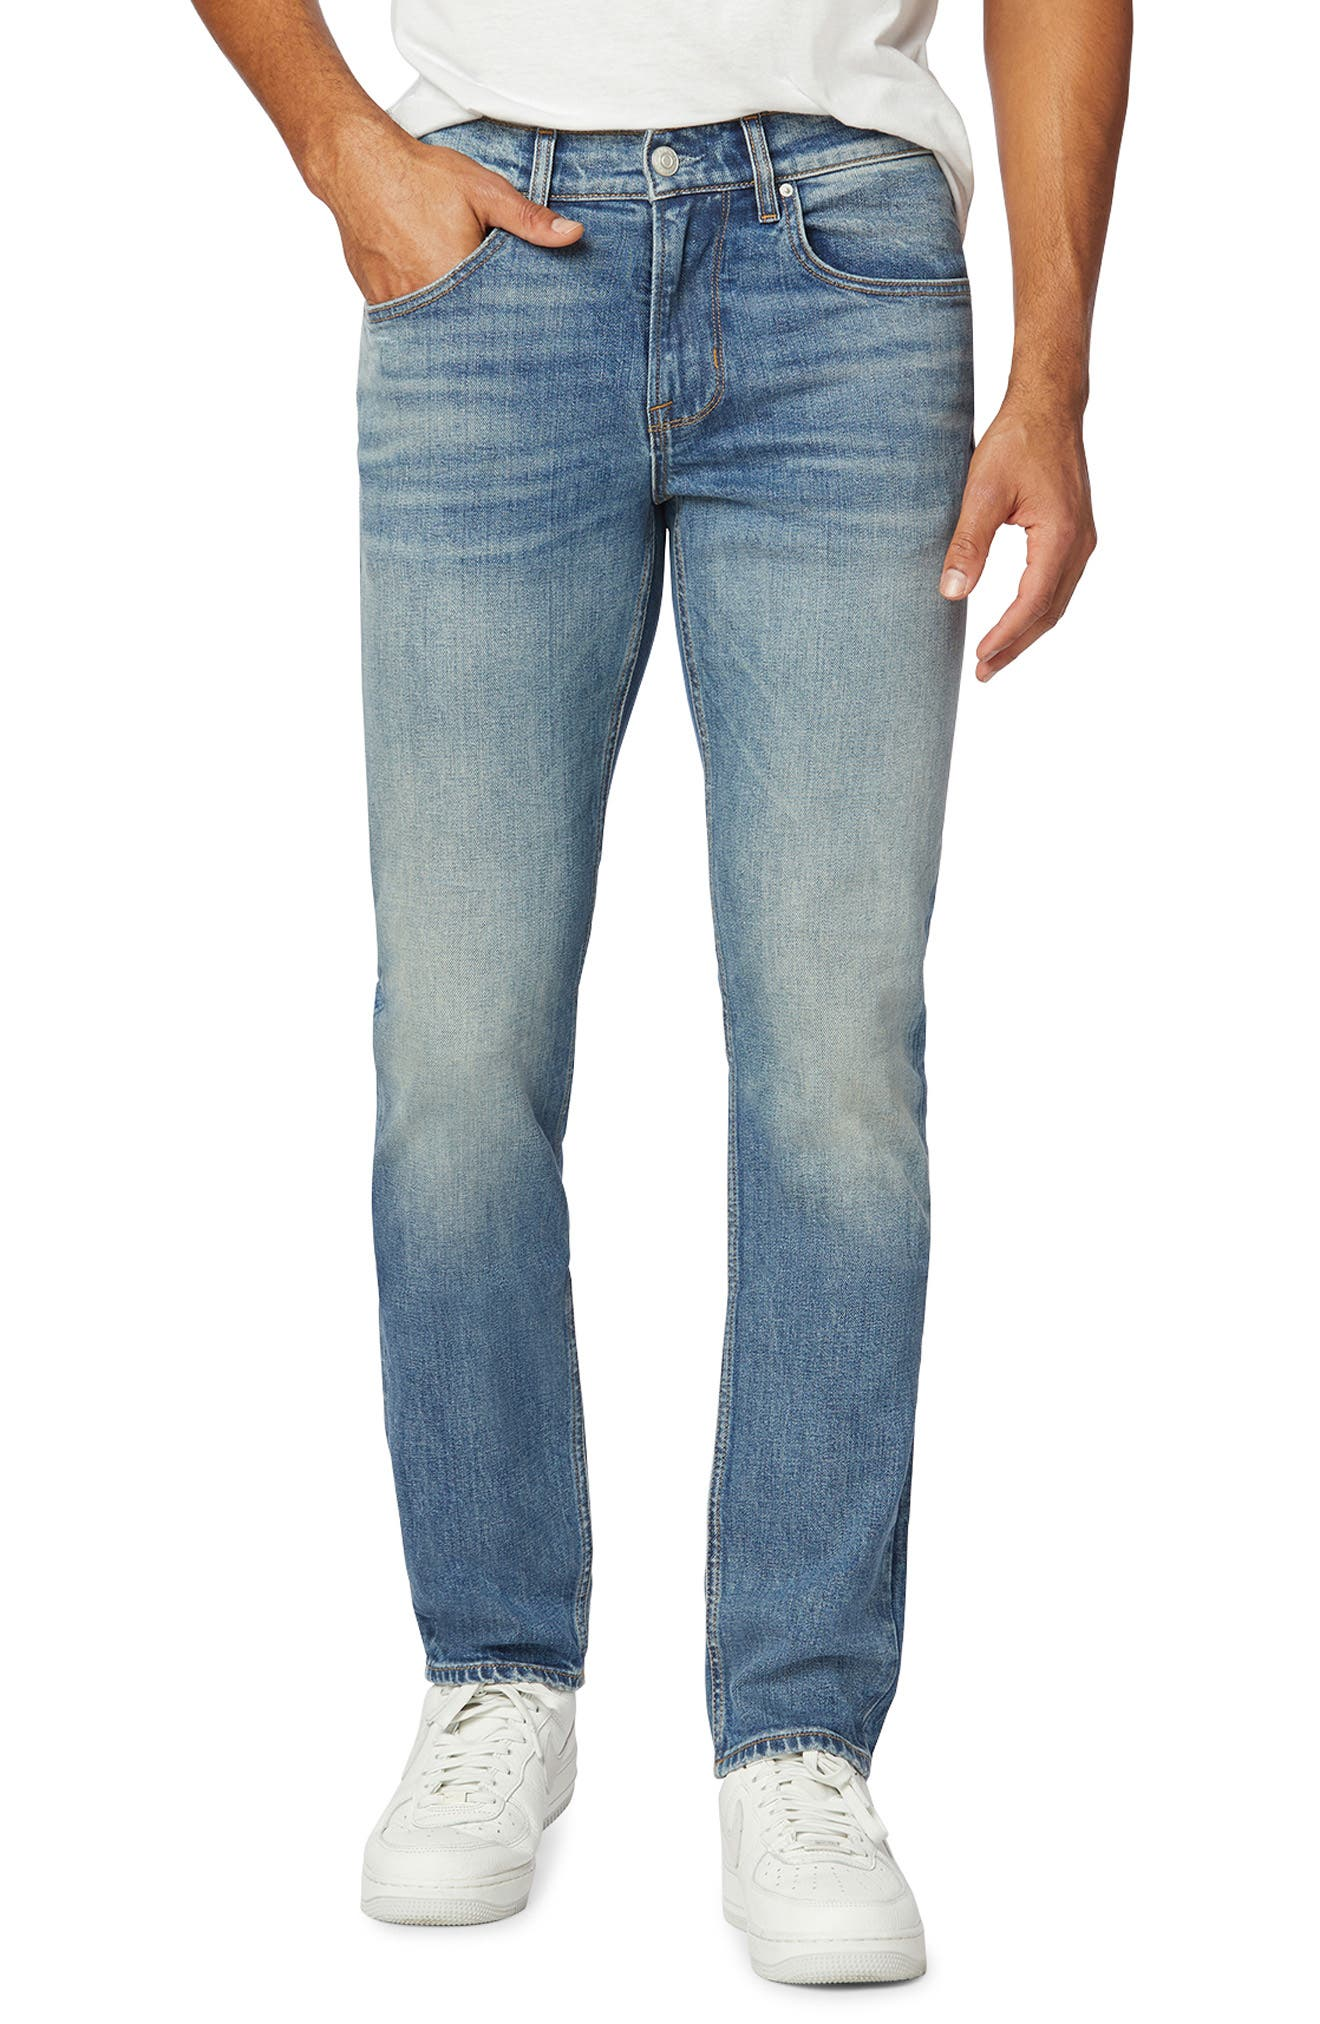 Blake Slim Straight Fit Stretch Jeans